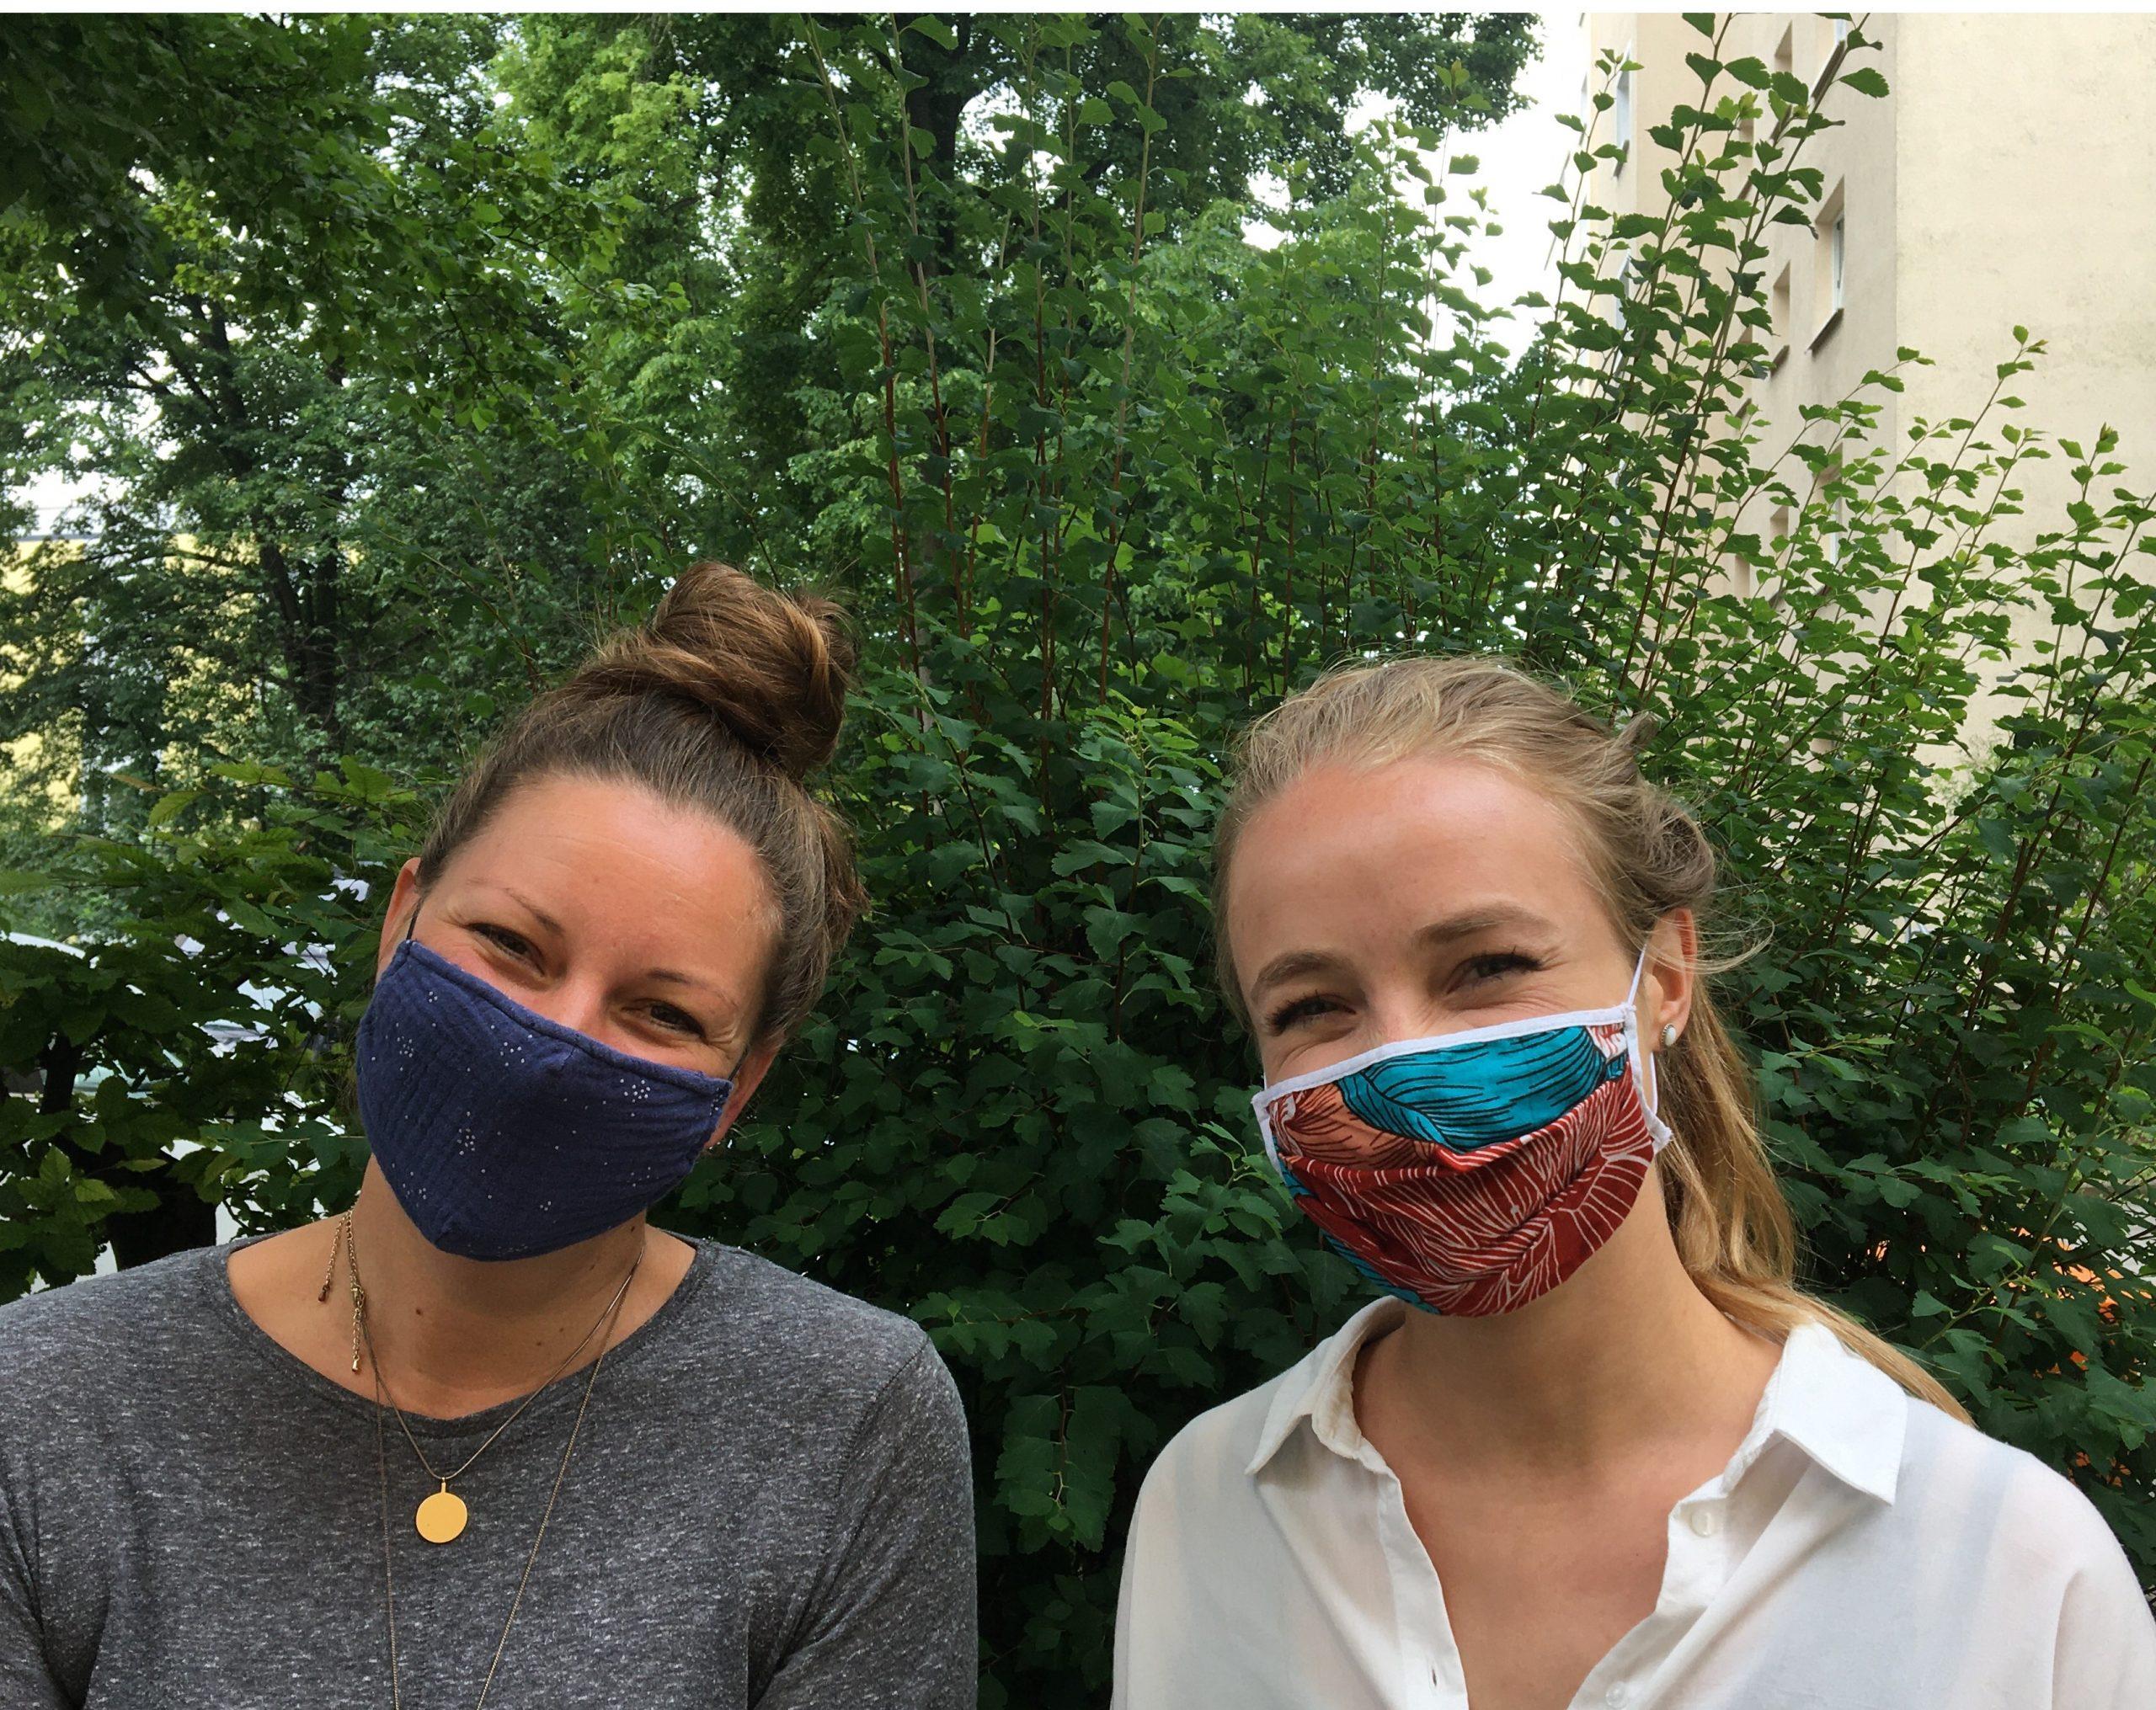 Nachbarschaftstreff Domagkpark: Treffleitungen Nicola Eggert und Sina Wörsdörfer